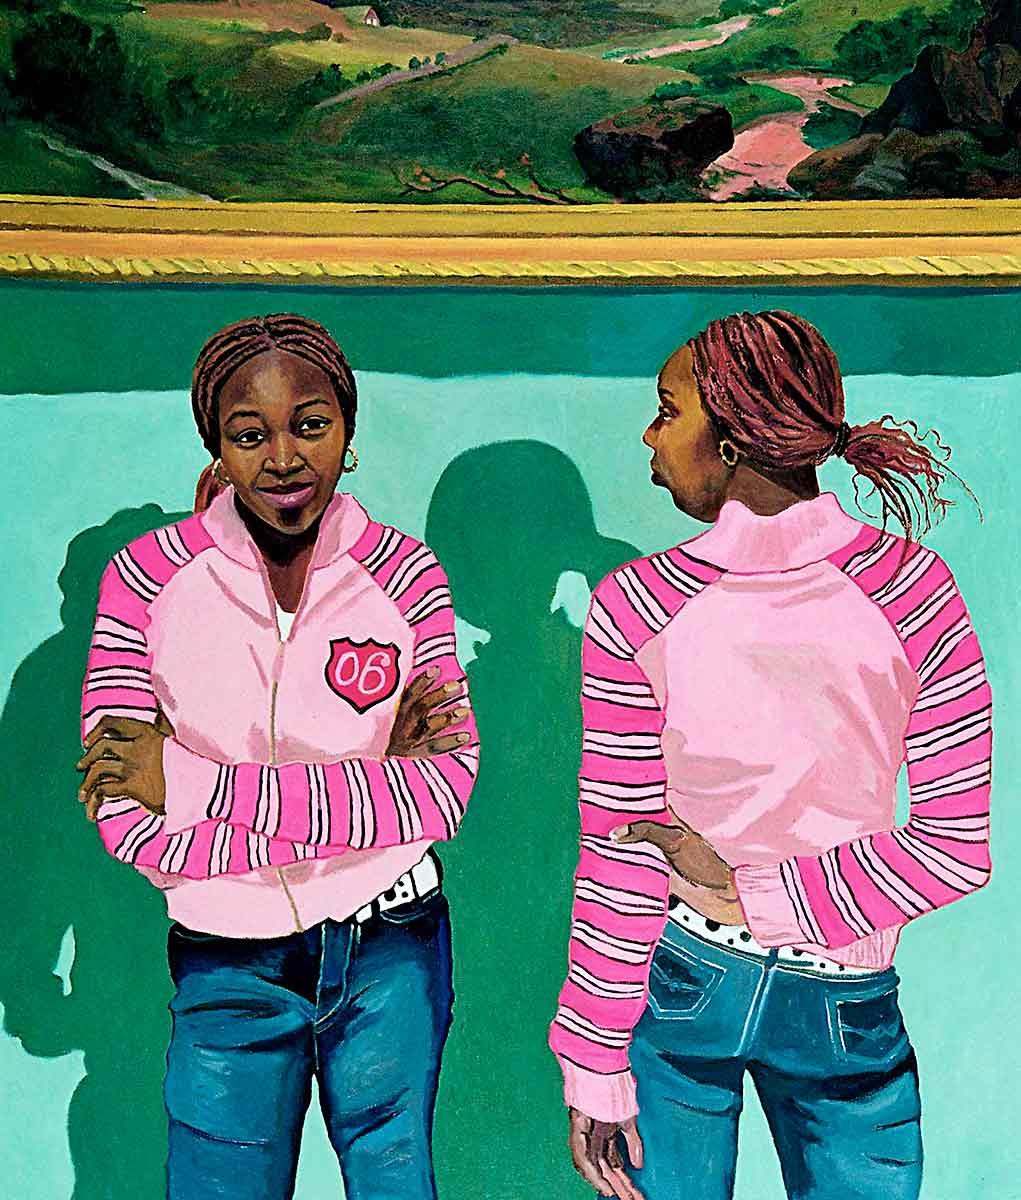 Anastasia Clervil, Portraits of Science Explorers, Newark, Oil on canvas, Mary Alice Copp